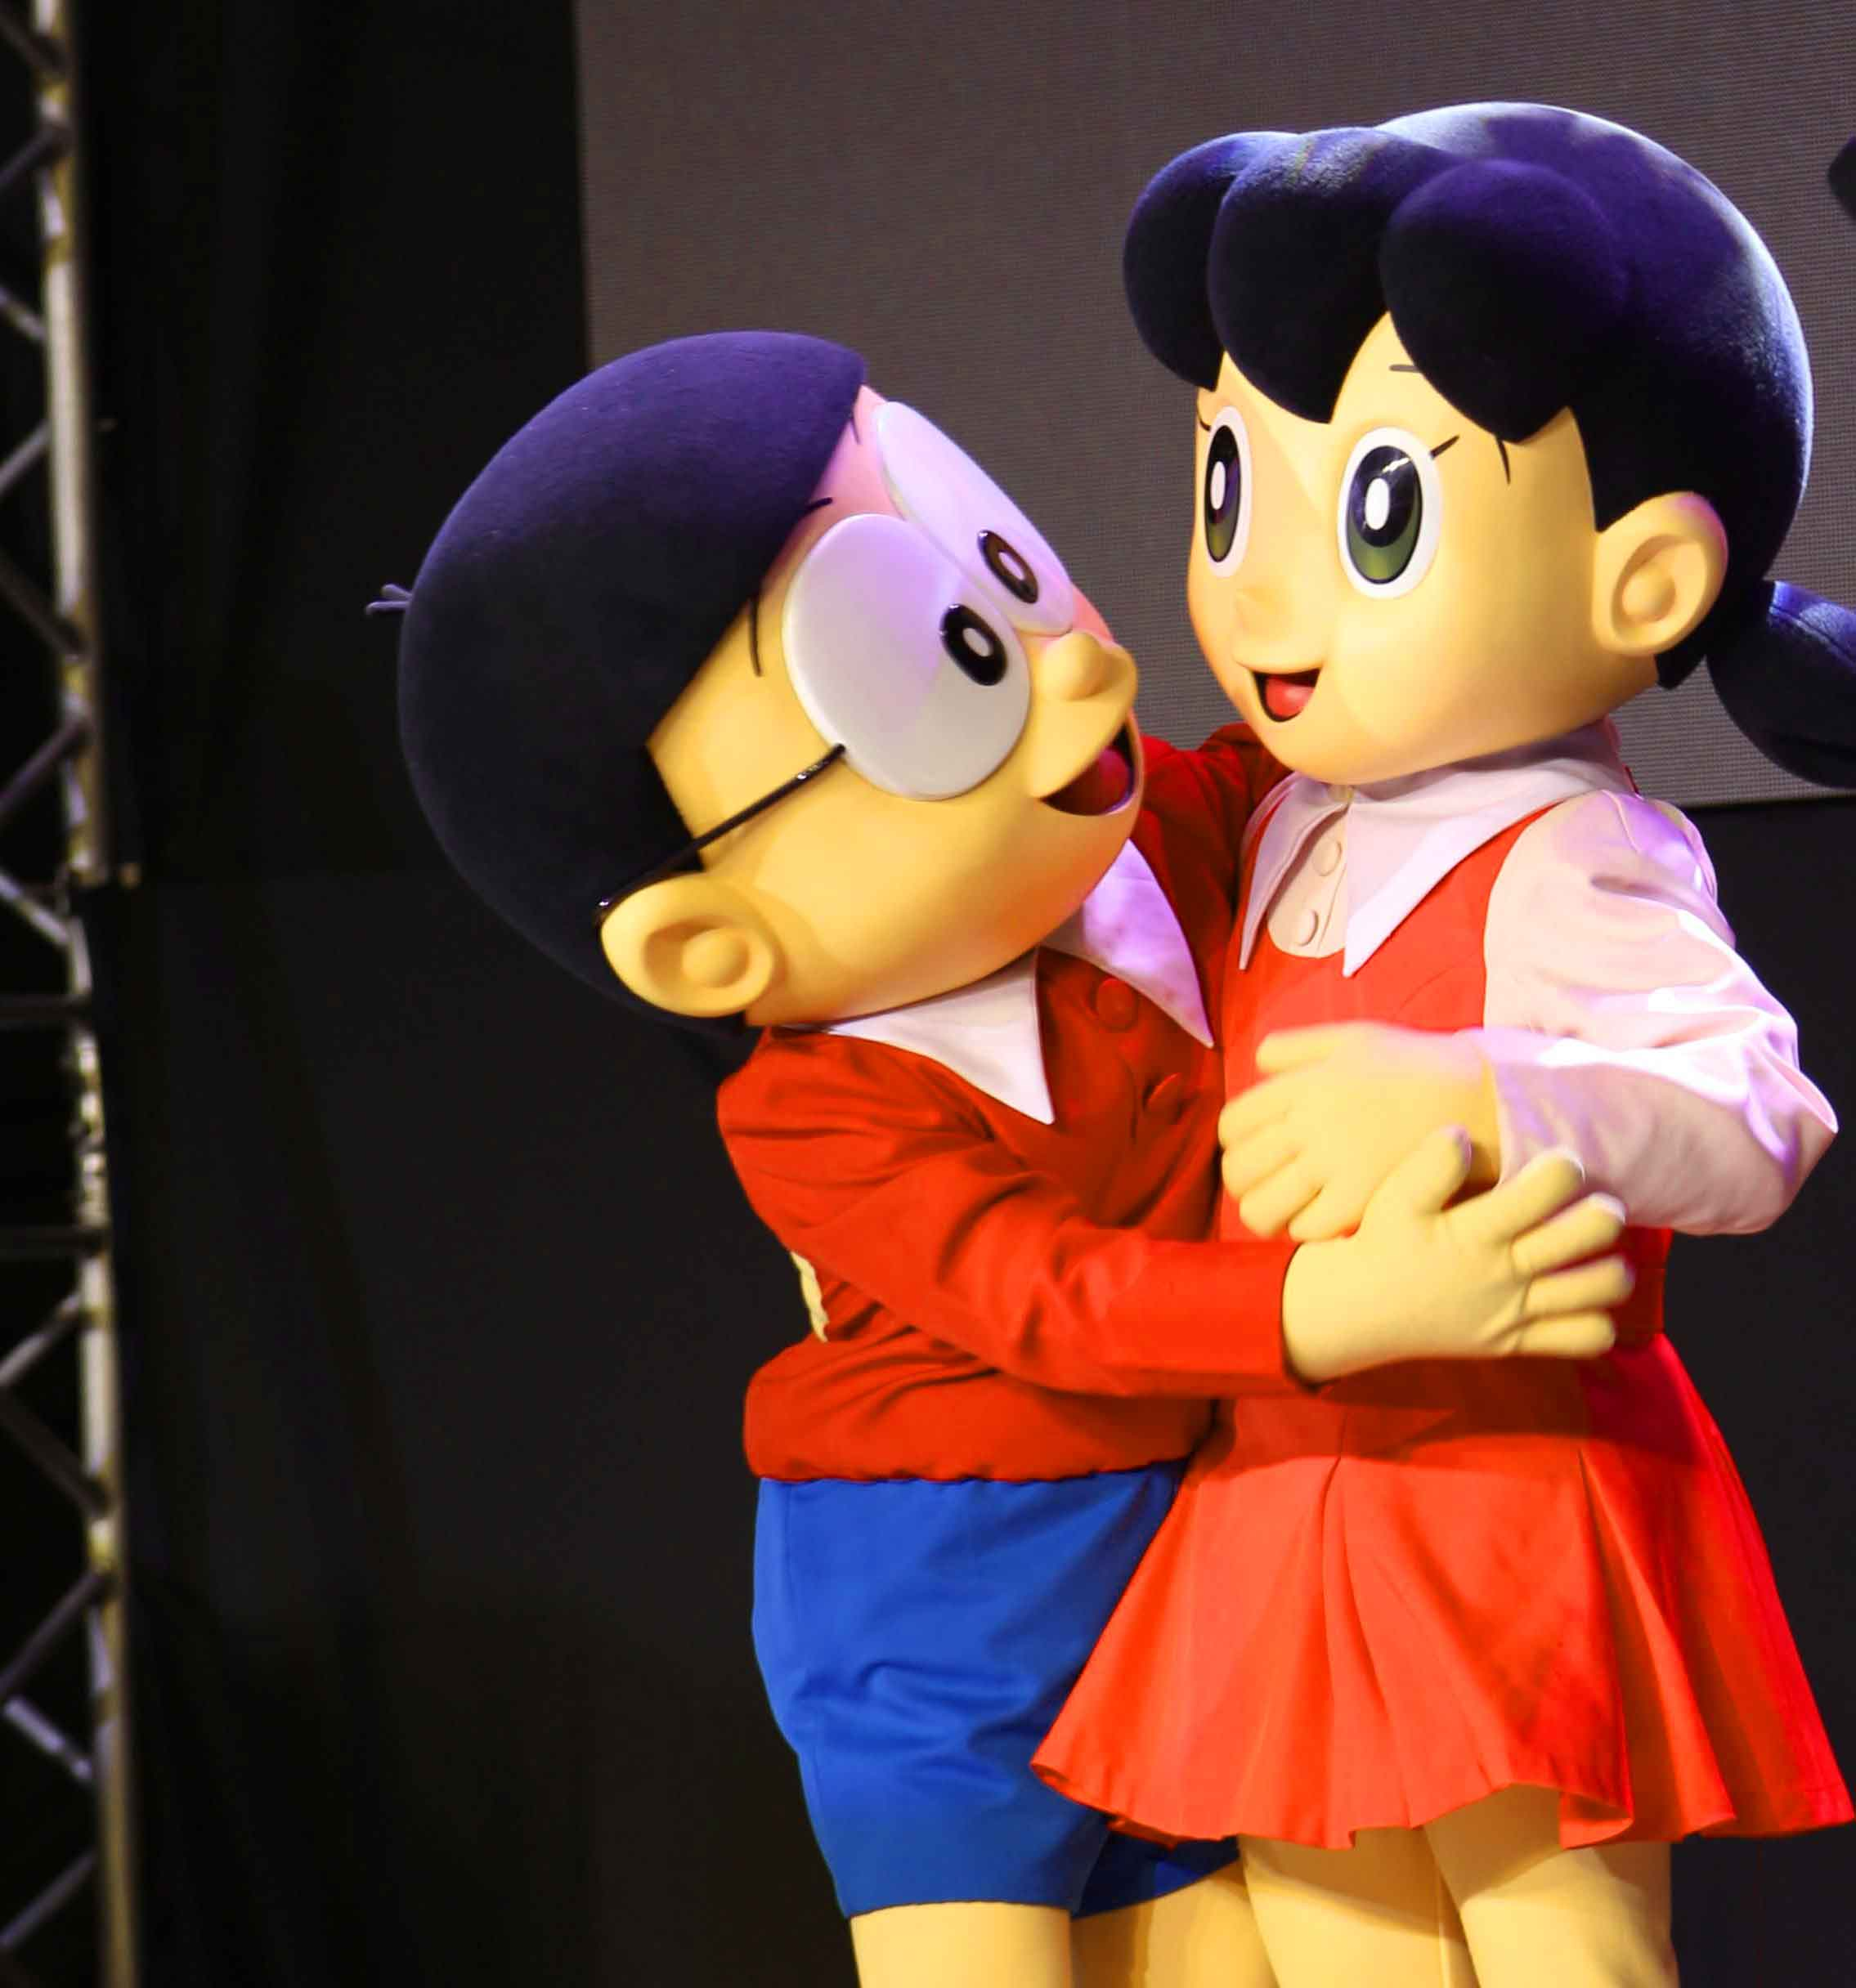 romantic nobita shizuka whatsapp Profile pics hd